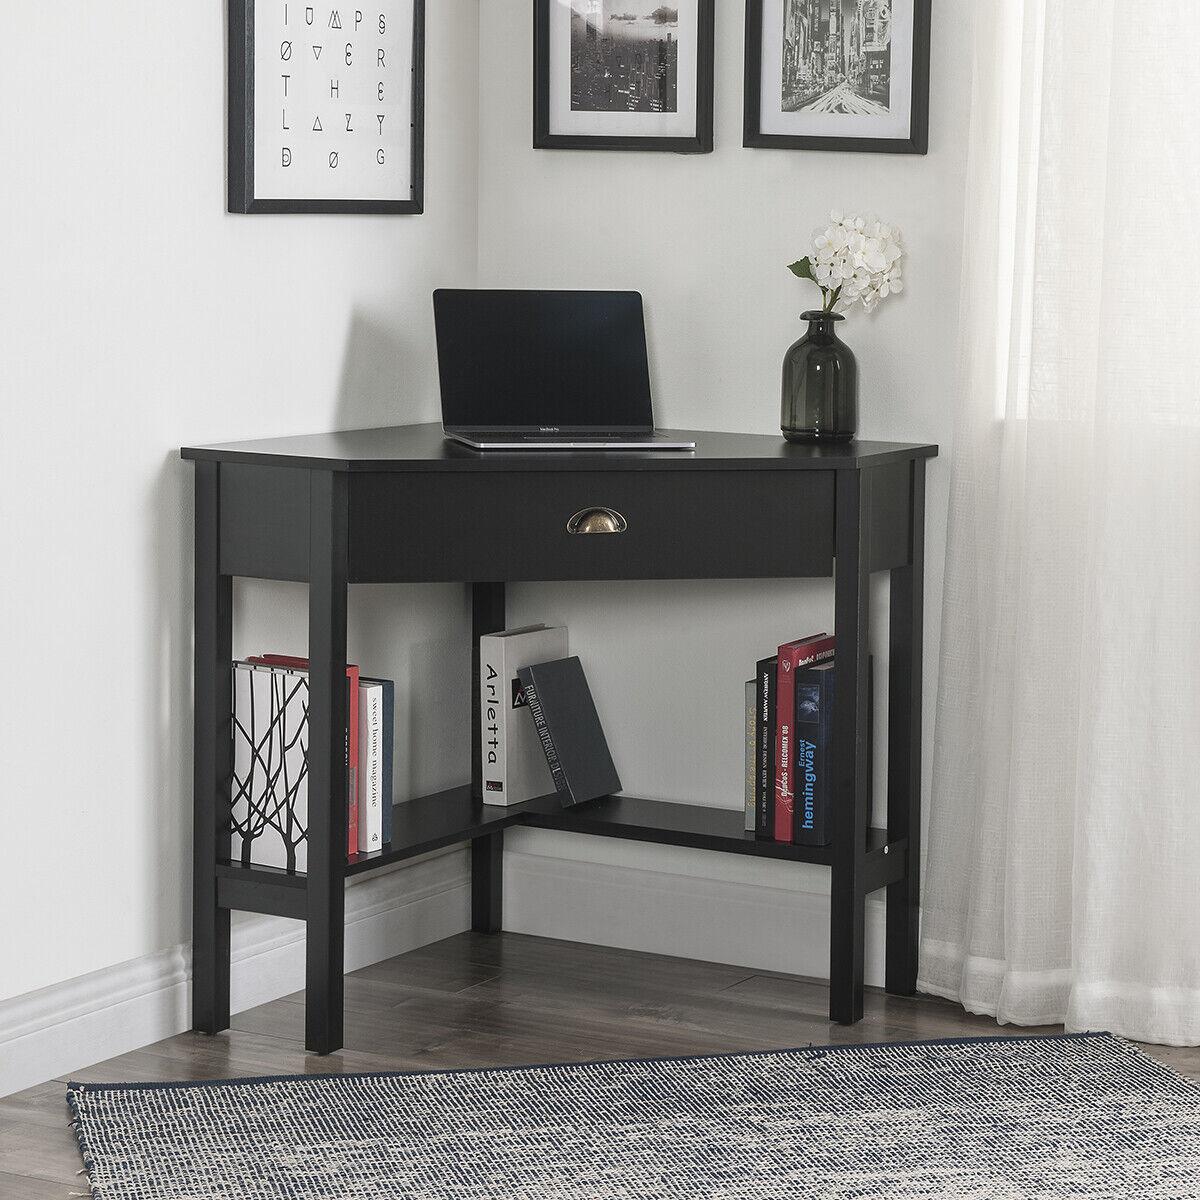 Morgan Corner Computer Desk And Hutch Black Oak For Sale Online Ebay